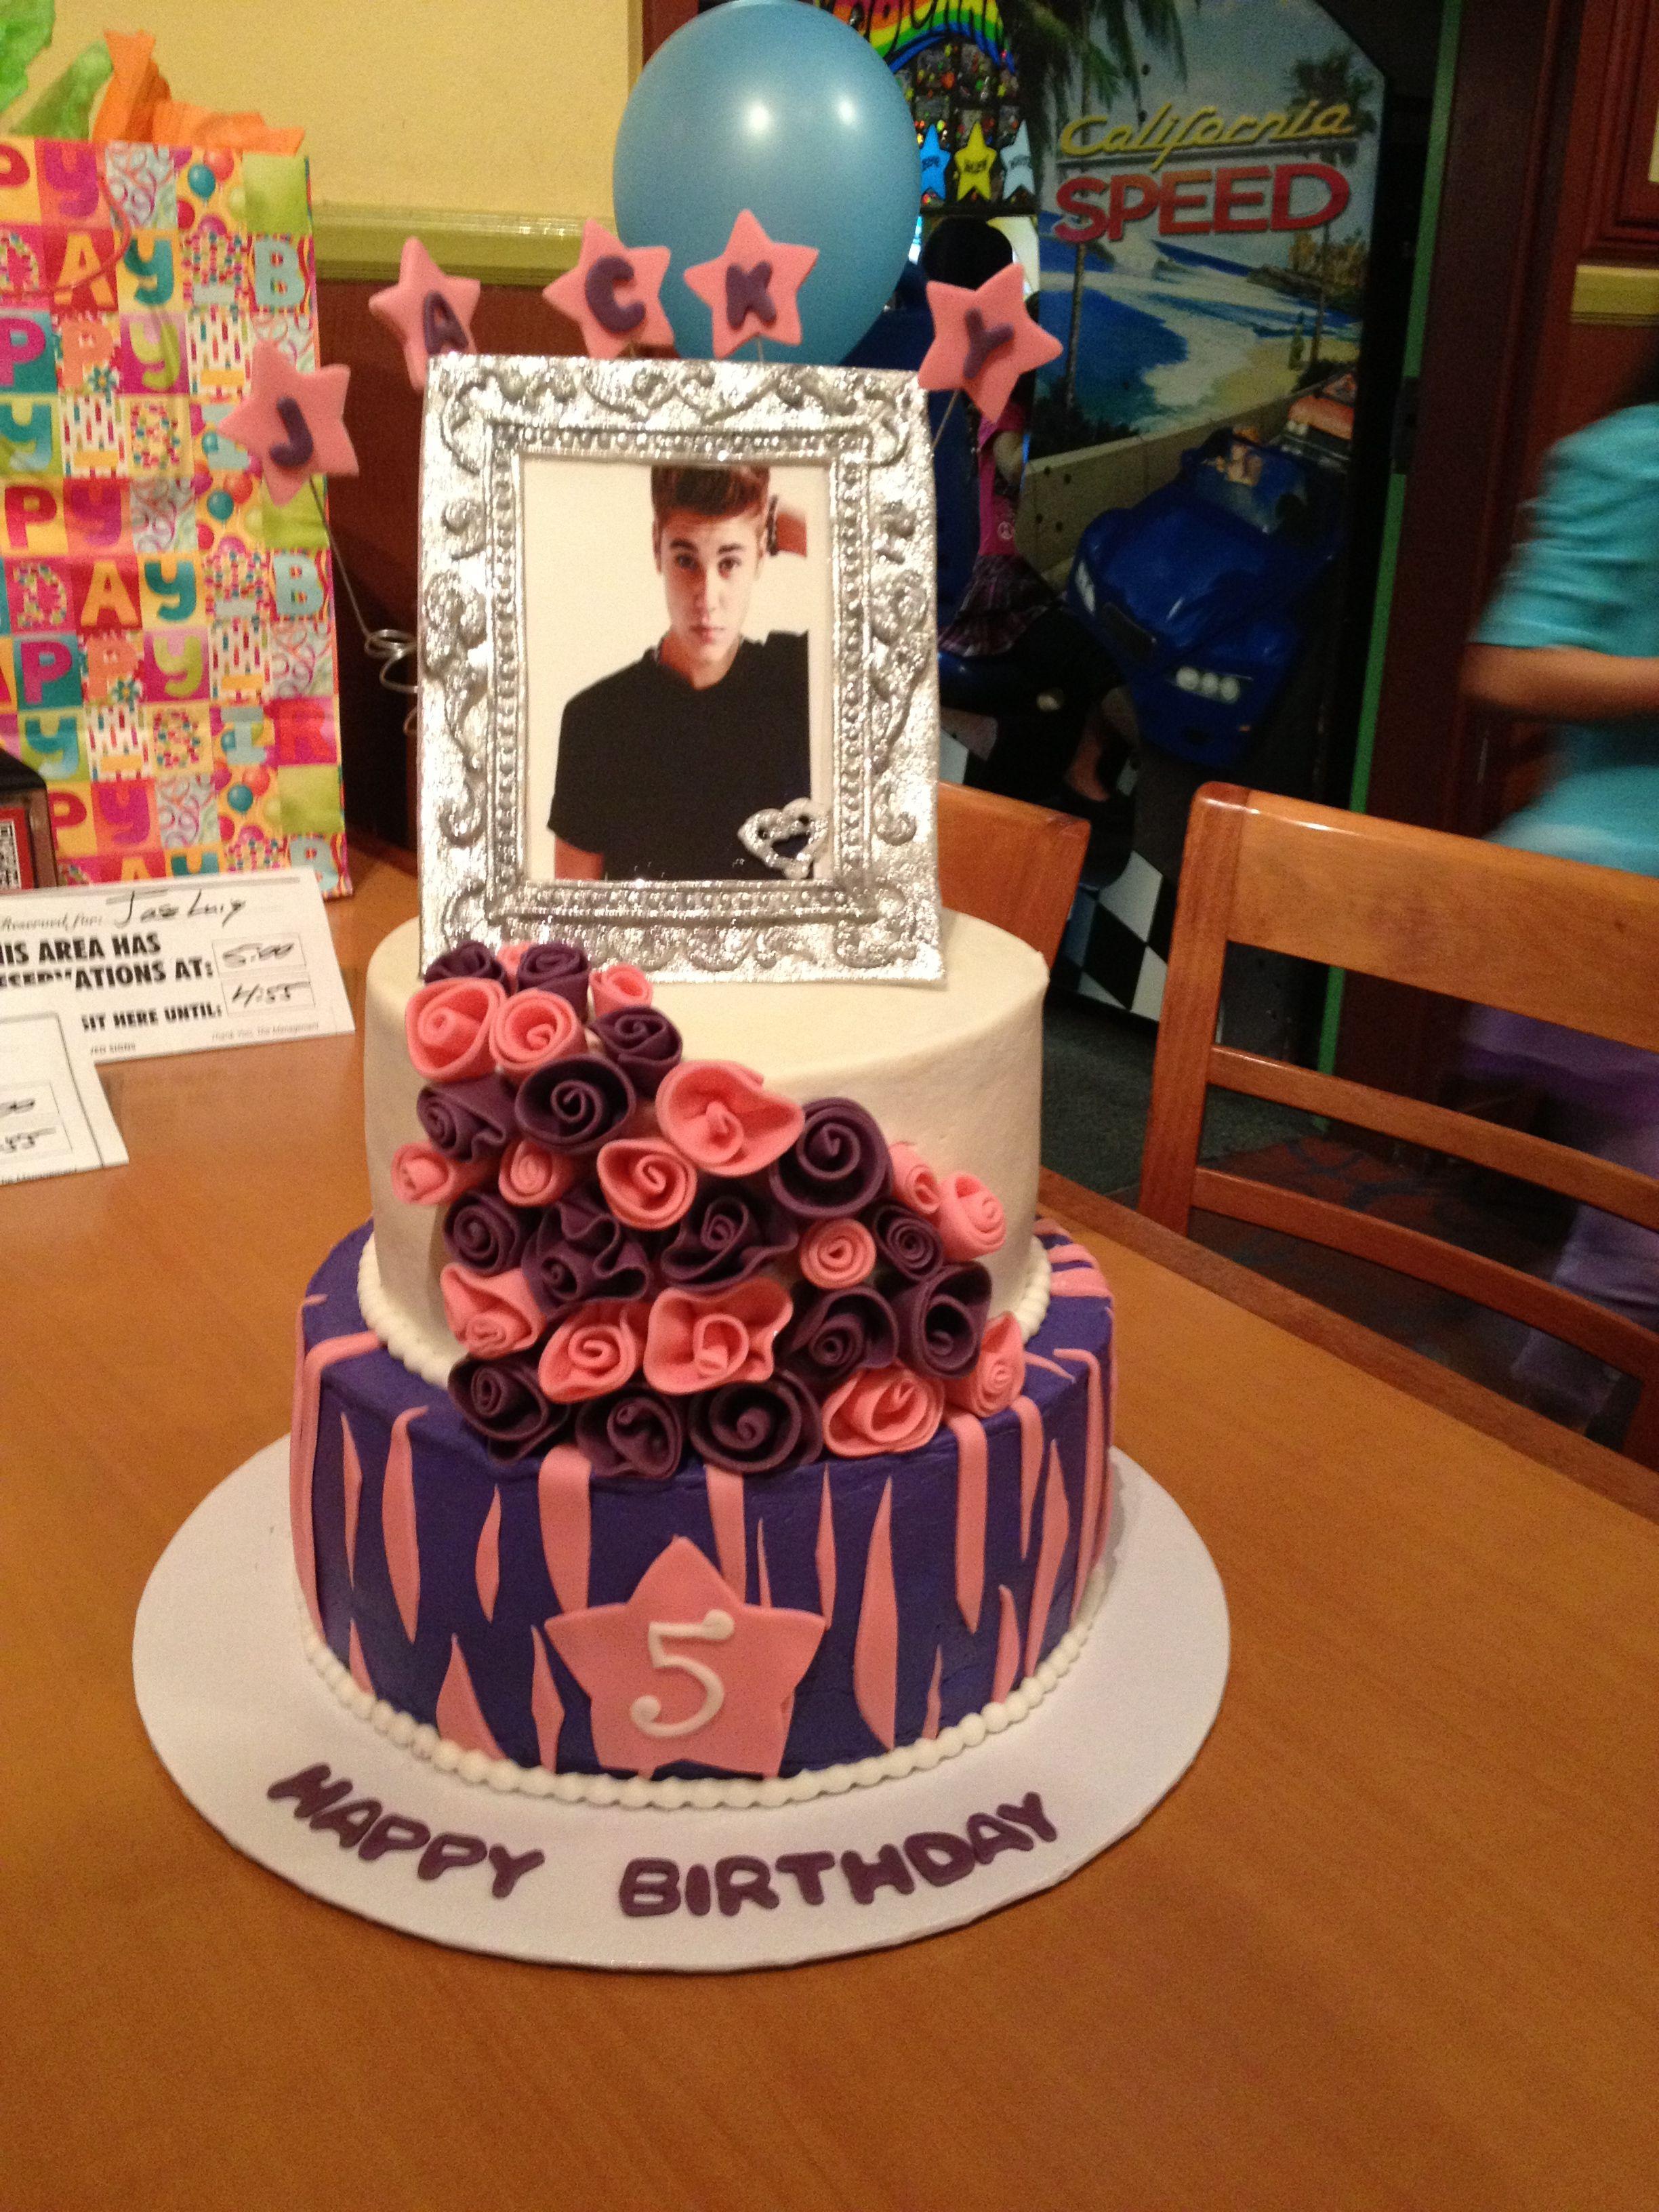 Justin bieber scrapbook ideas - Justin Bieber Cake Fondant Frame Colored With Disco Dust Edible Image